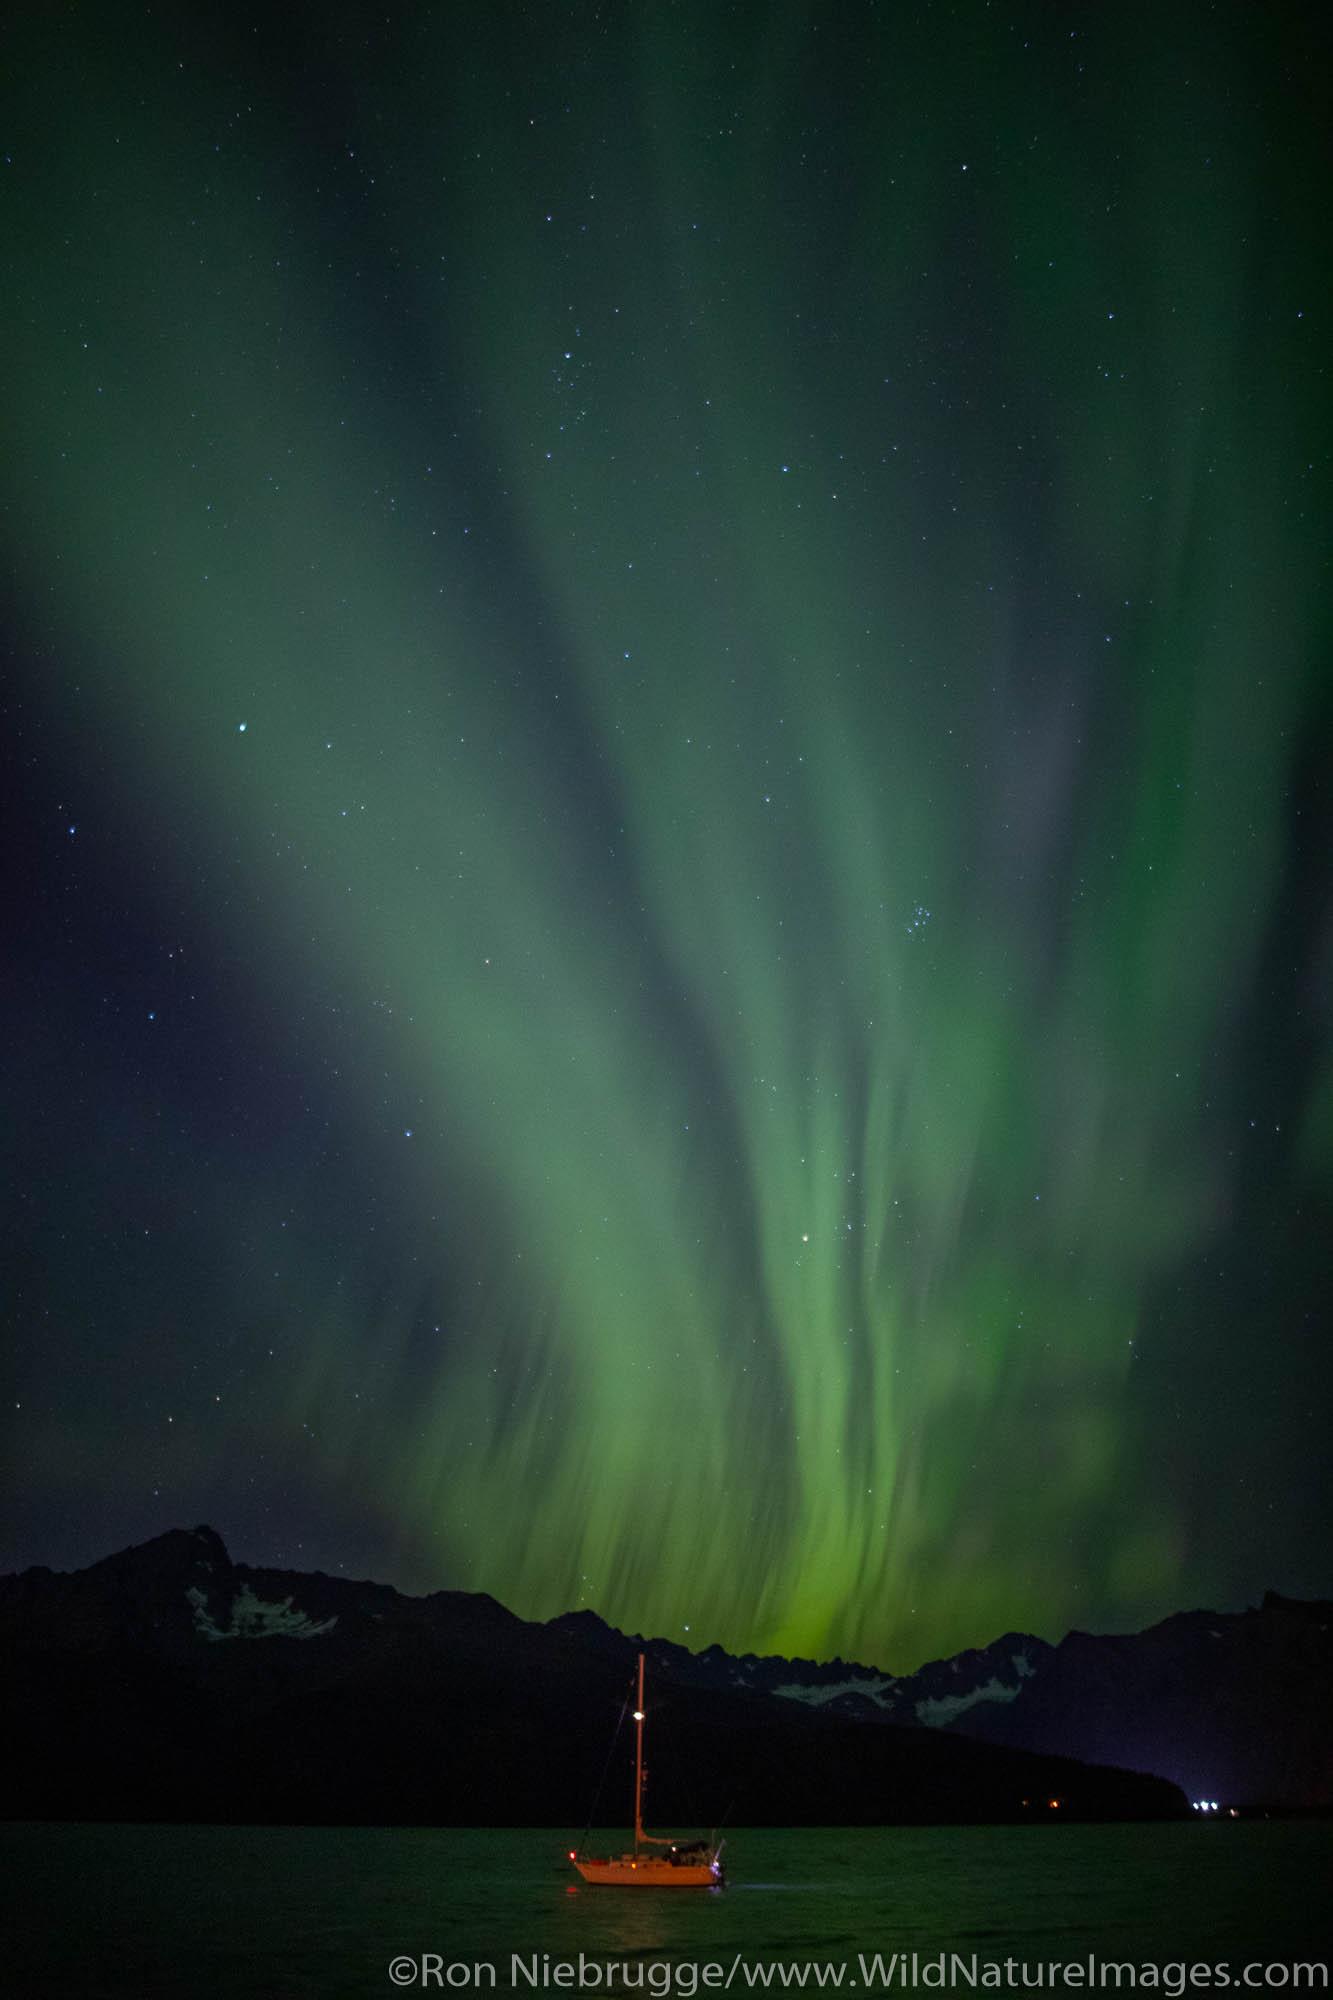 Northern Lights, also known as Aurora borealis, Seward, Alaska